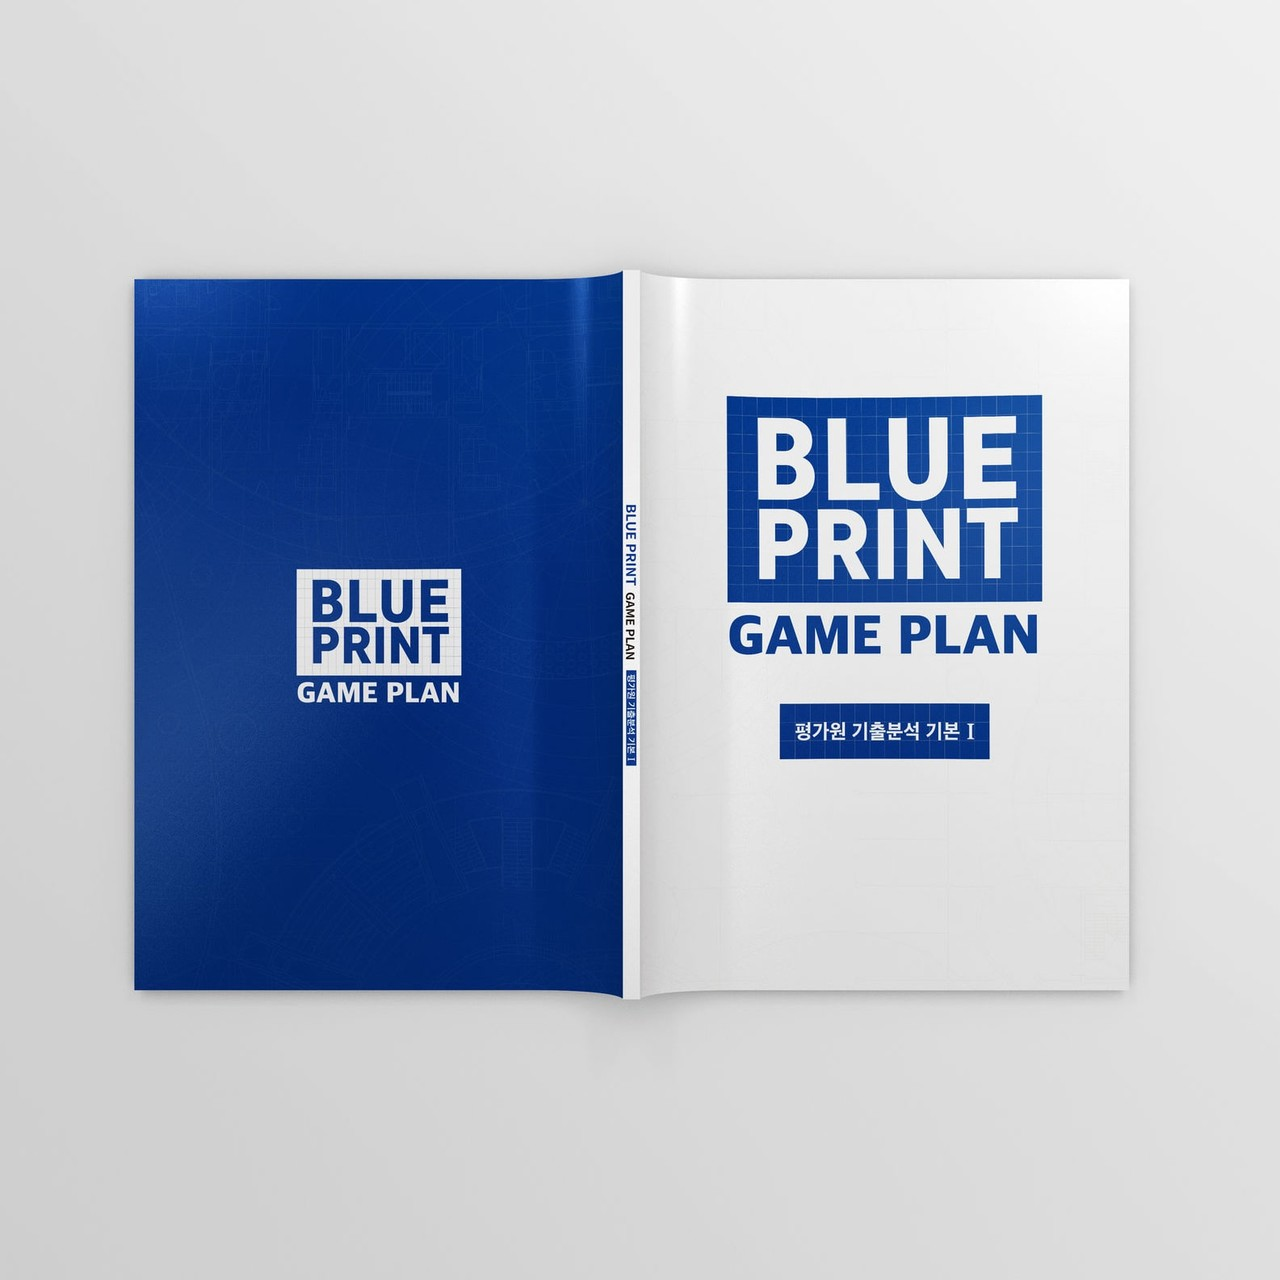 BLUE PRINT 게임플랜 문제집 디자인 시안 - 블루프린트